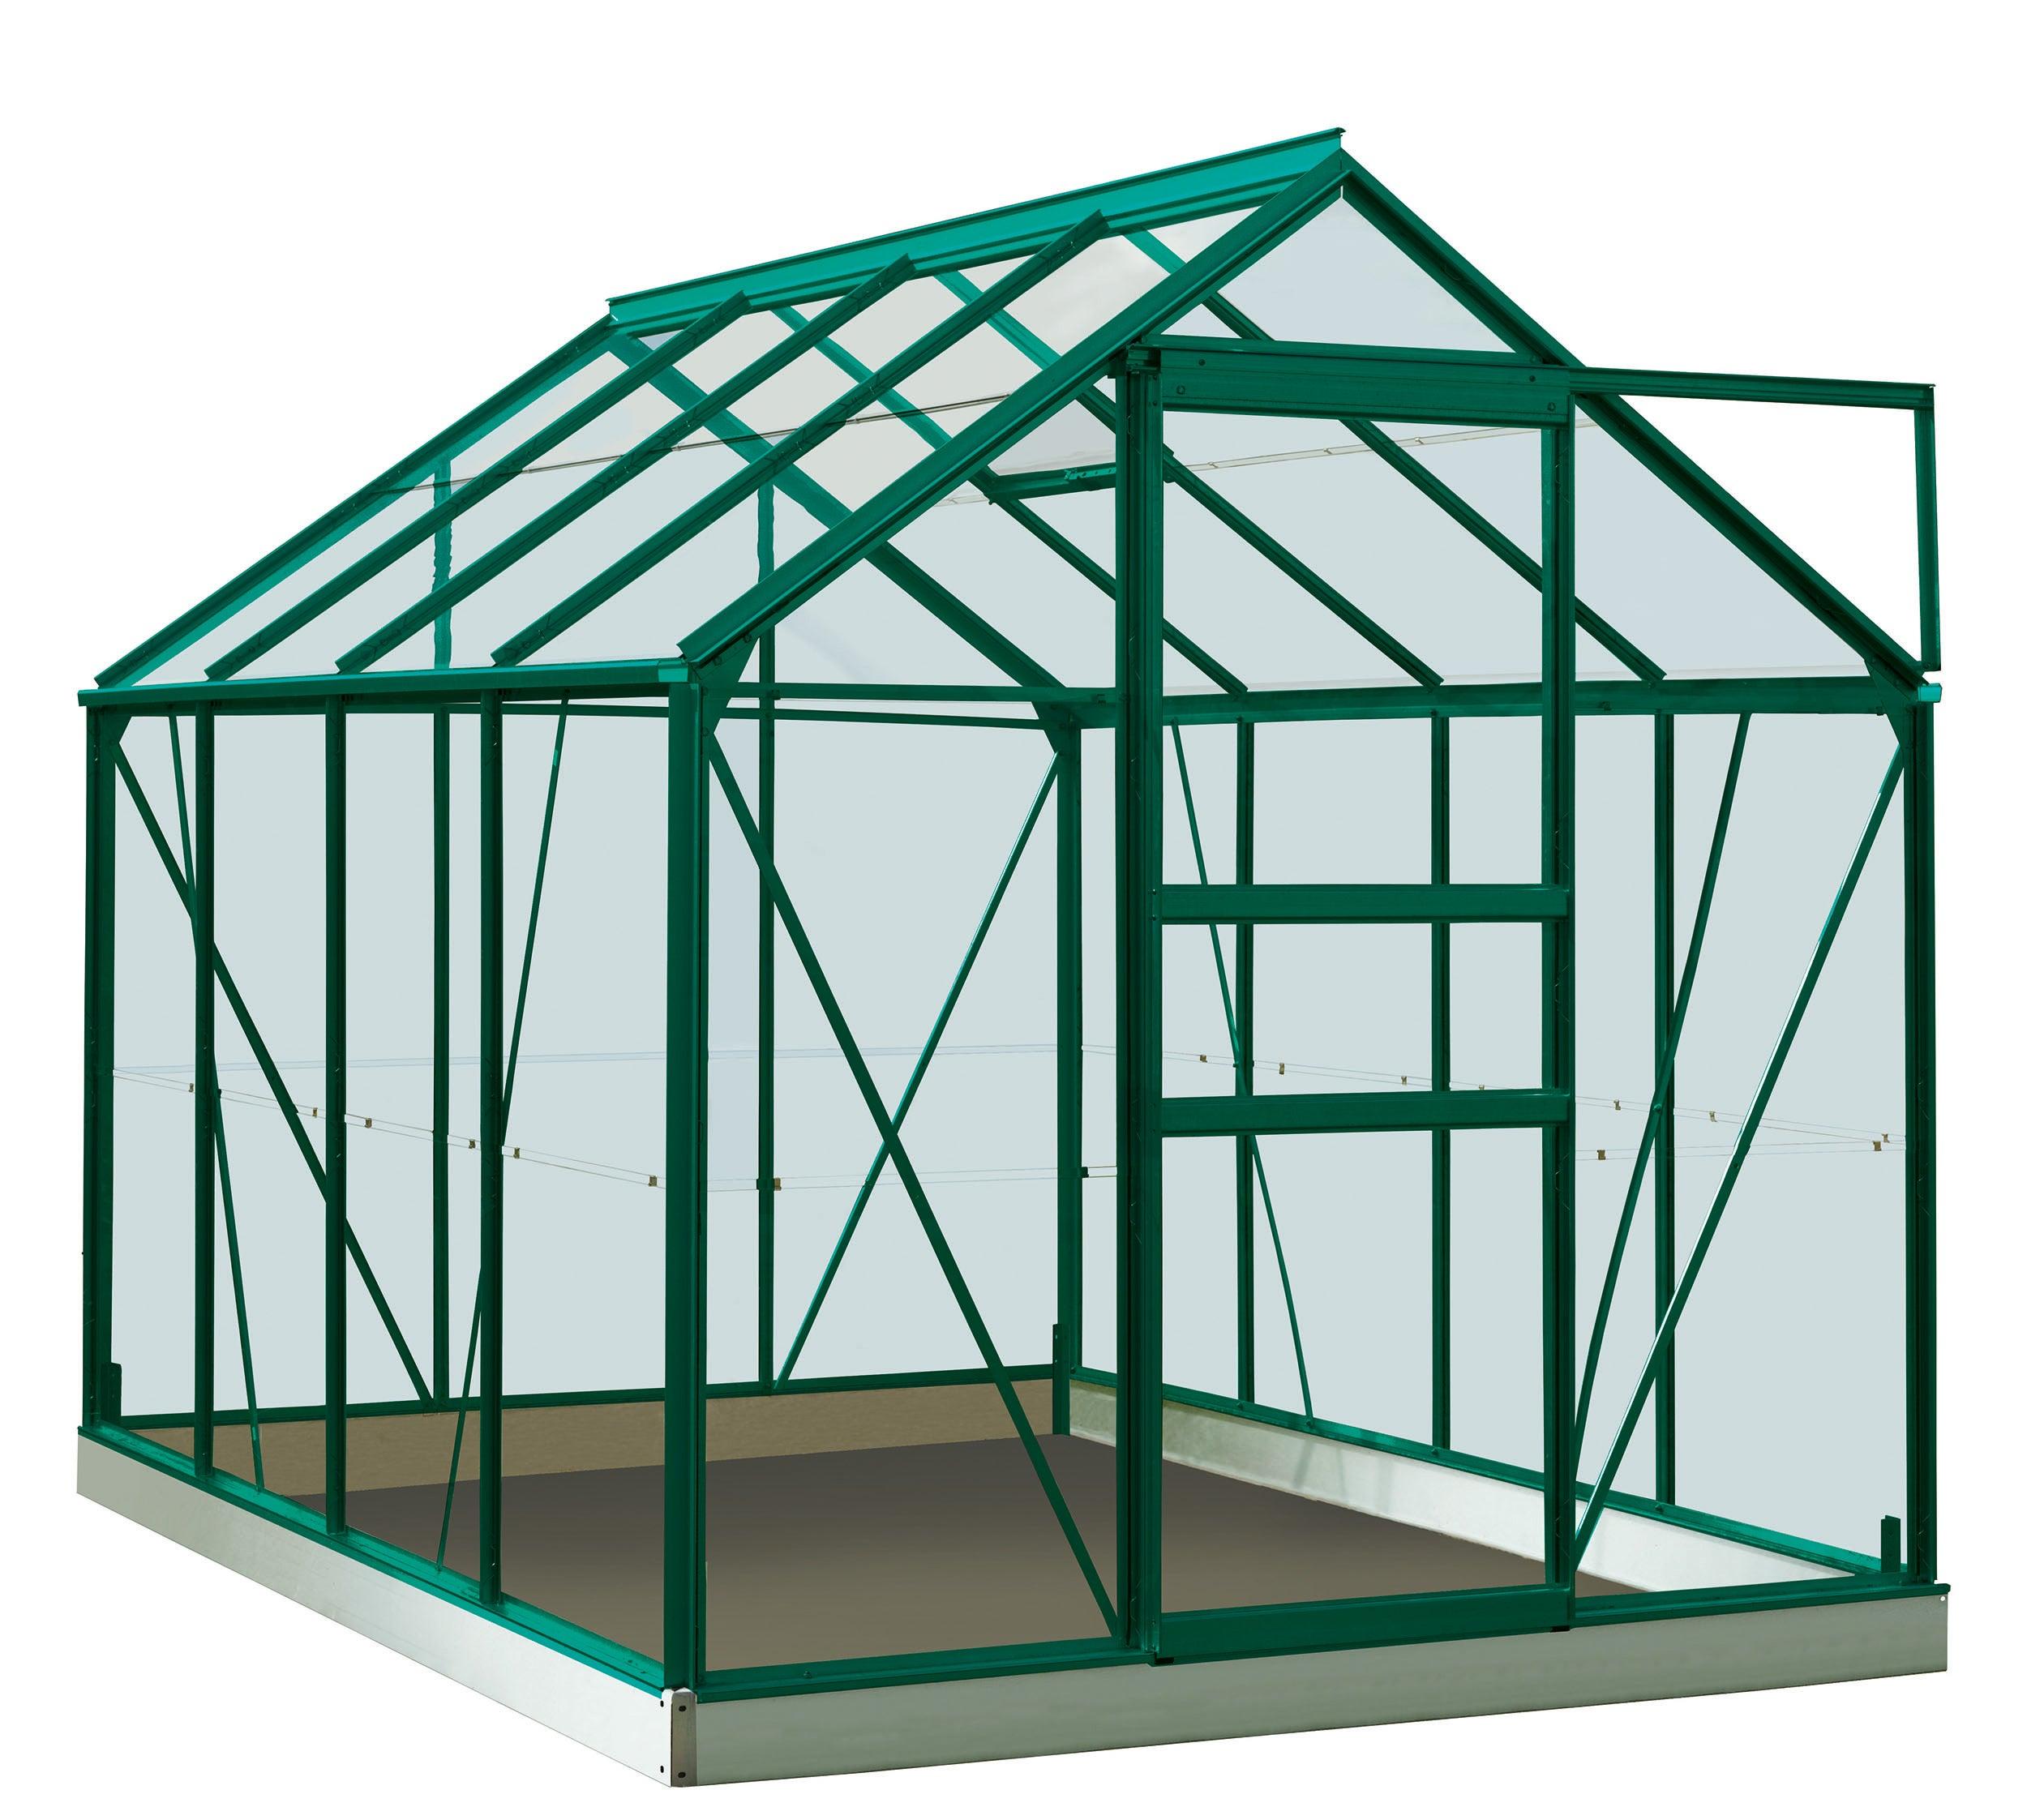 Serre De Jardin En Verre Trempé Rainbow Vert, 4.96 M² dedans Serre De Jardin Leroy Merlin